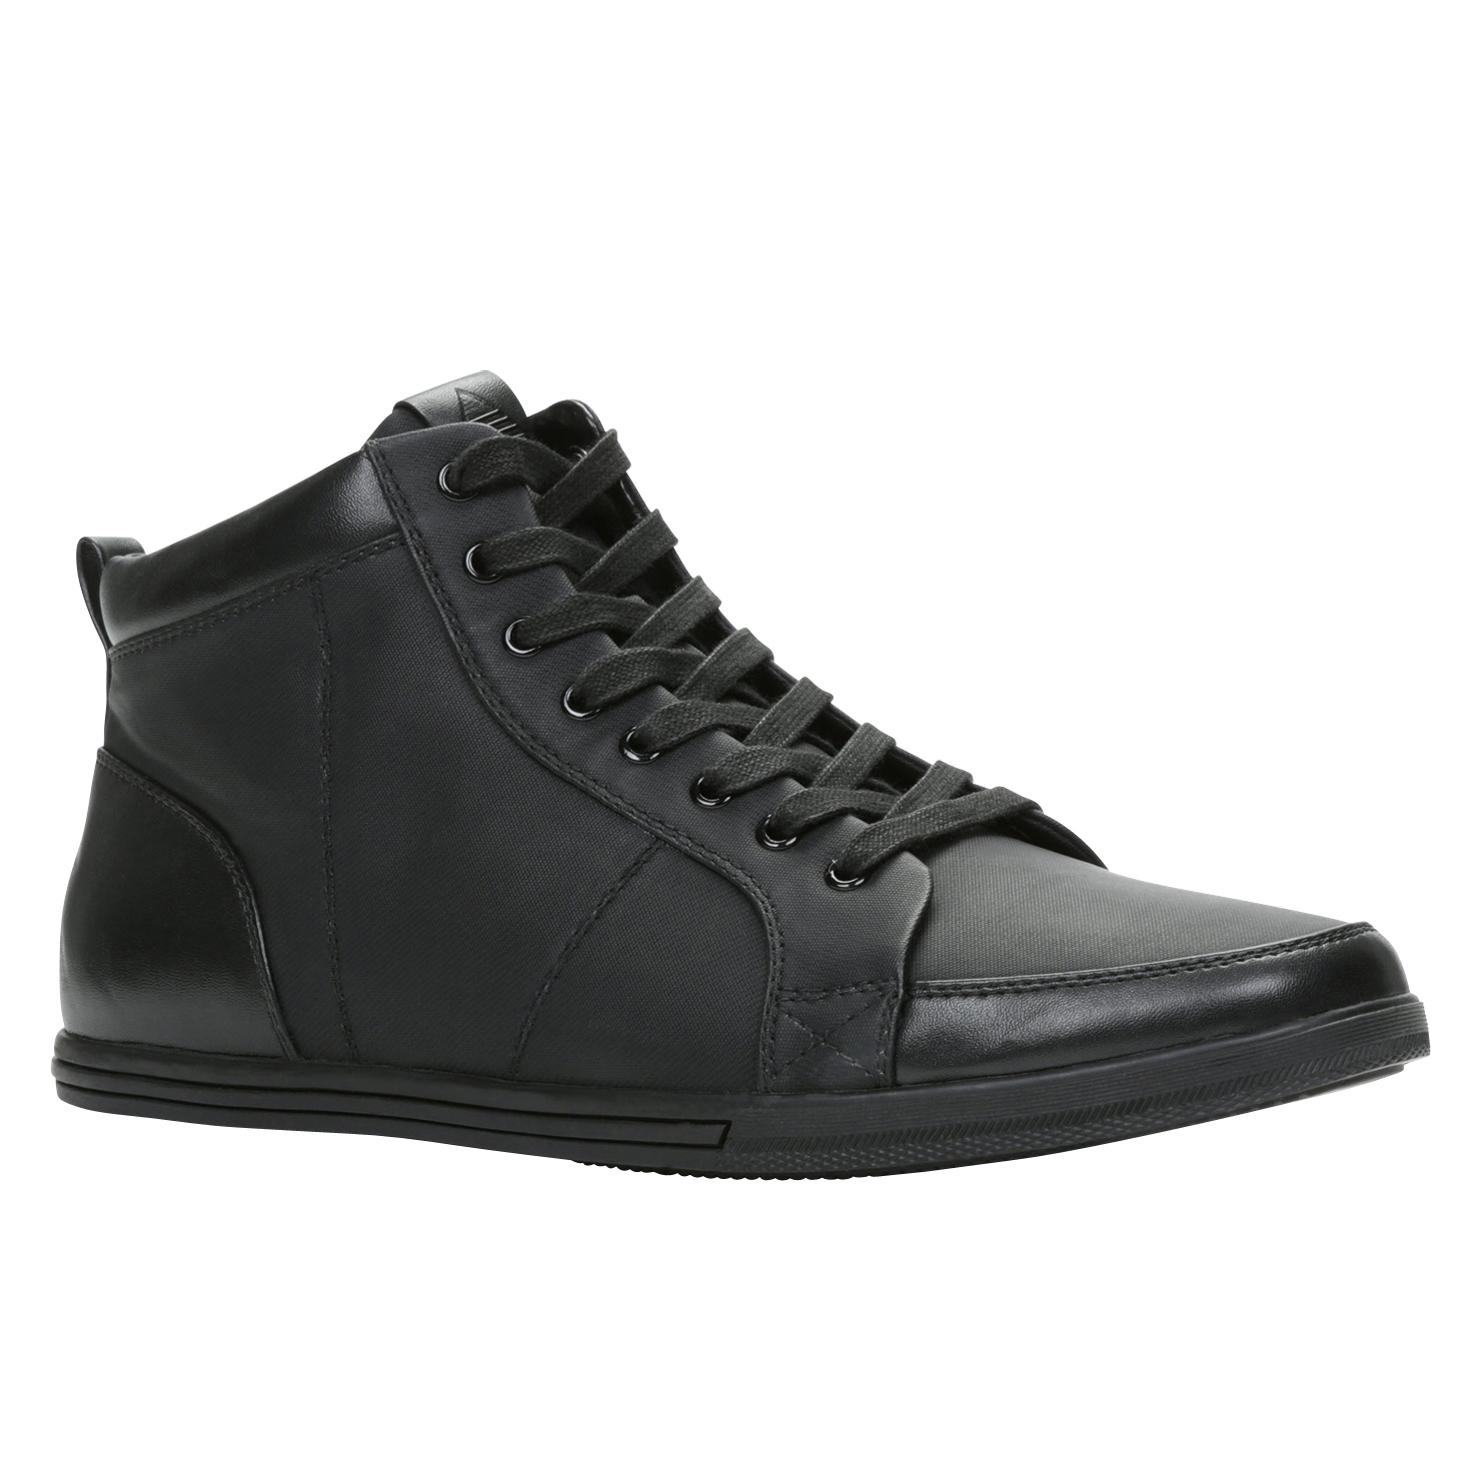 Hackett Black Shoes